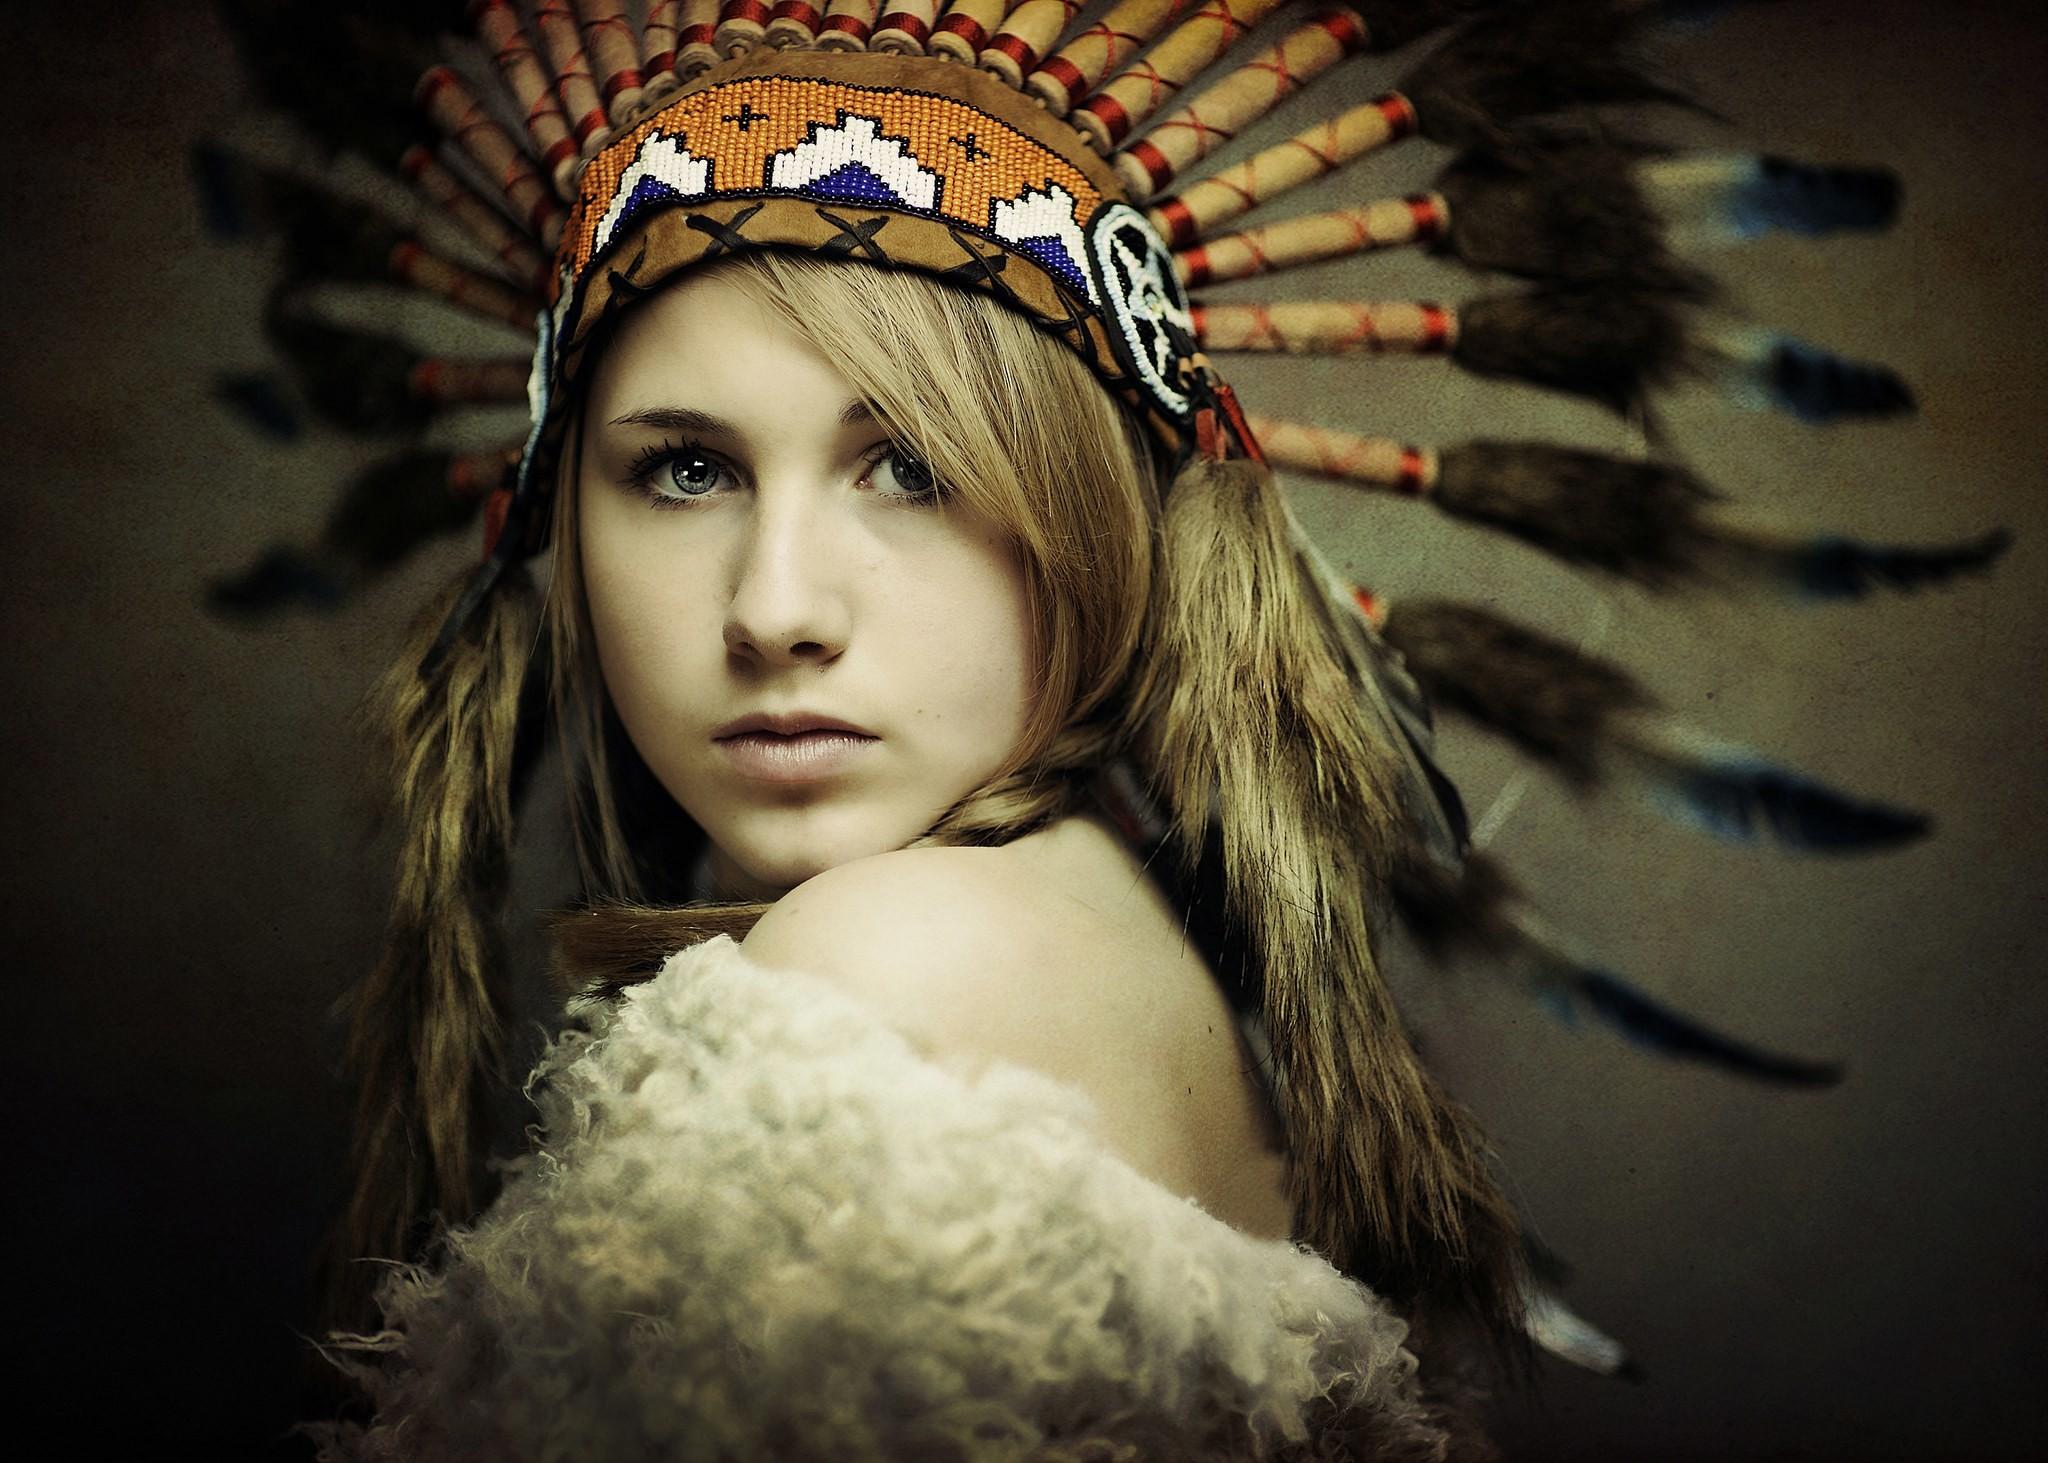 Native american screensavers and wallpaper 64 images - Indian ladies wallpaper ...